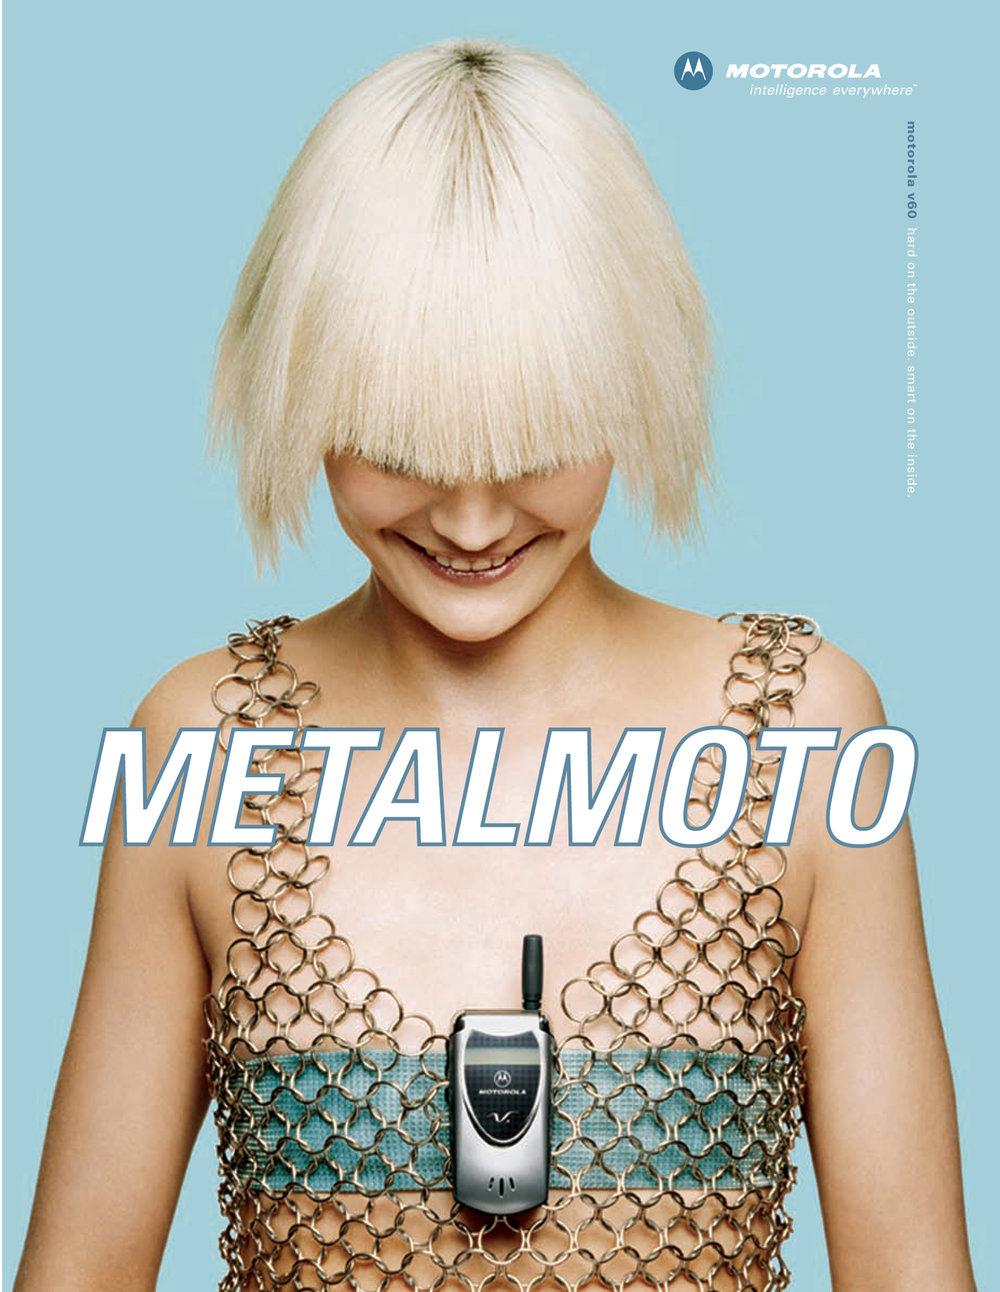 Moto1_o.jpg